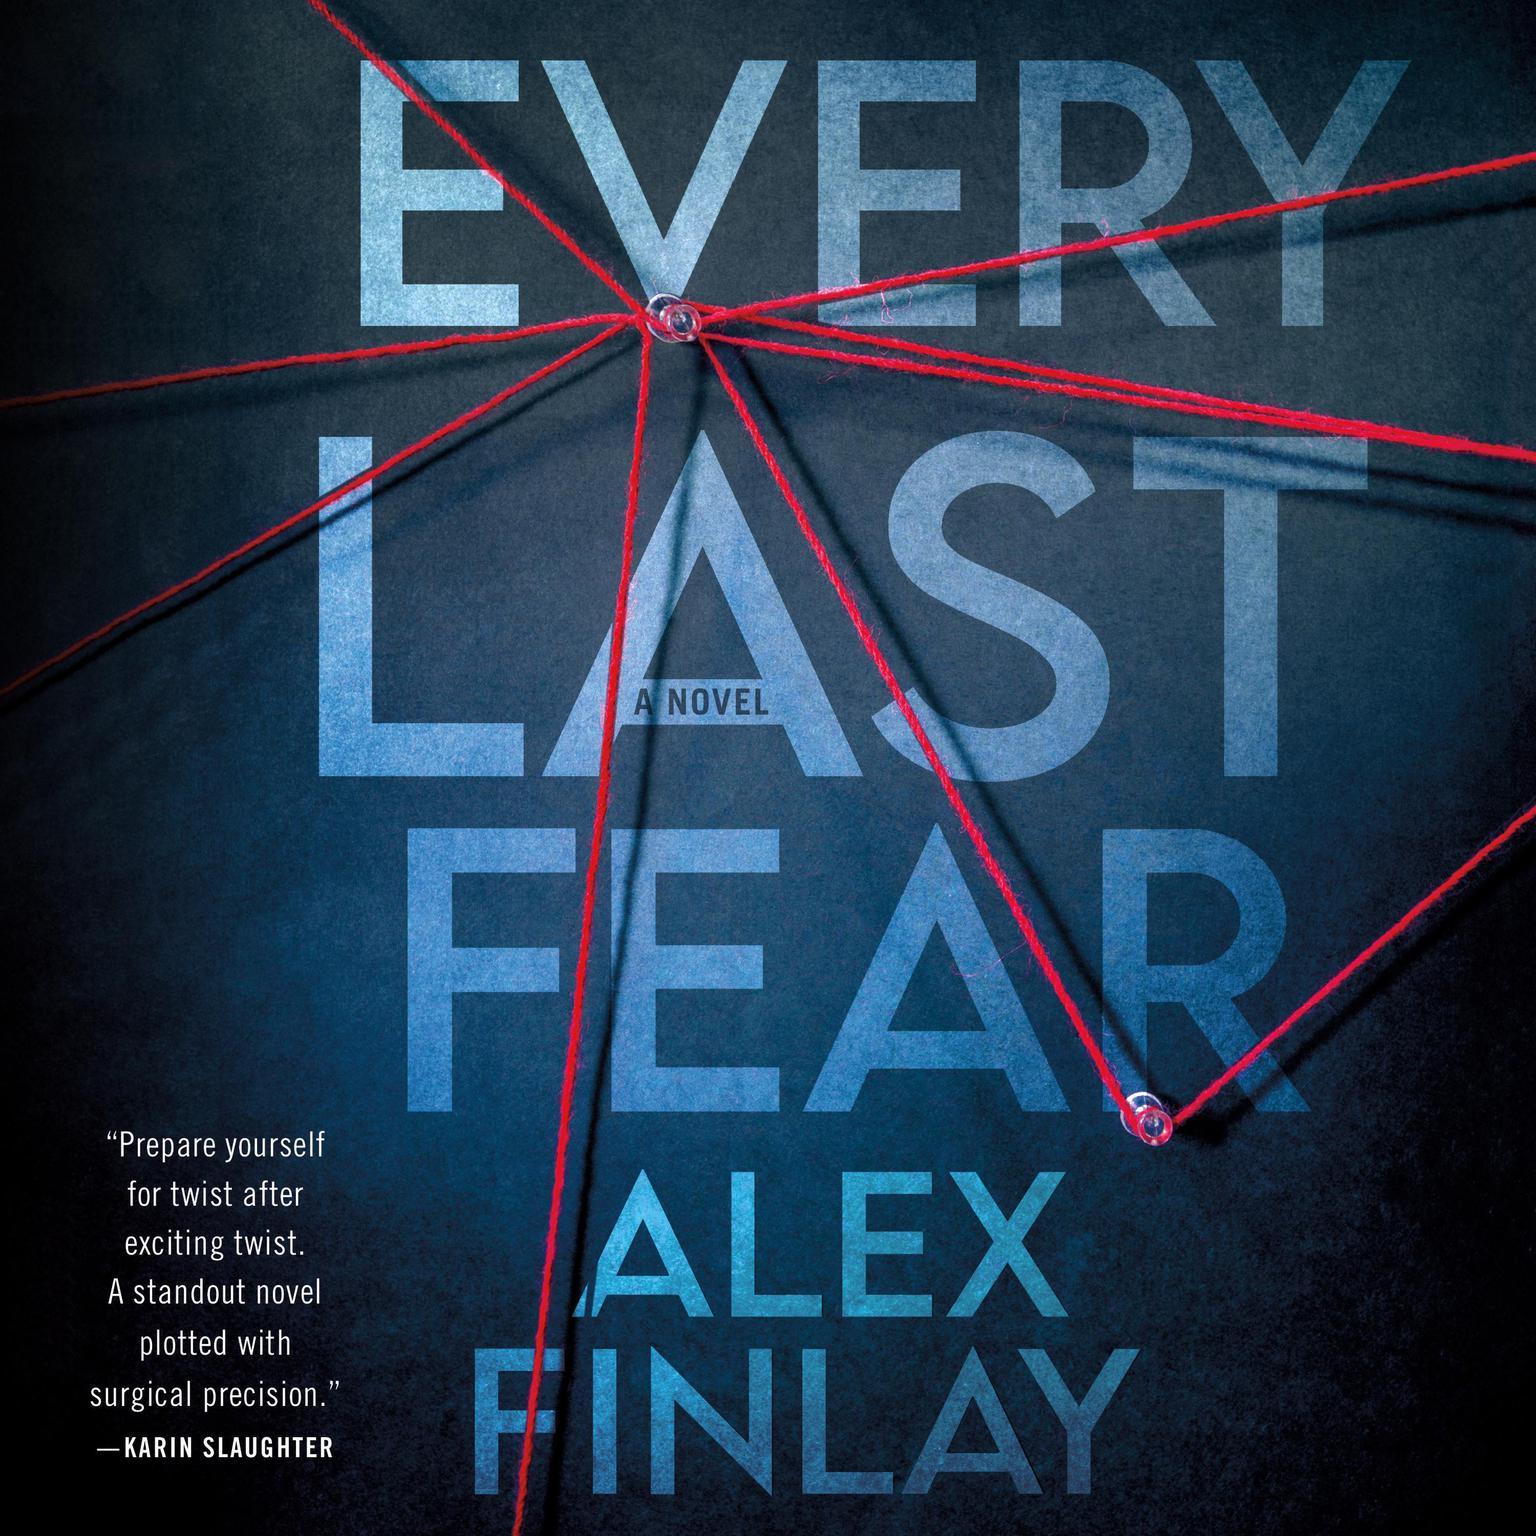 Every Last Fear: A Novel Audiobook, by Alex Finlay